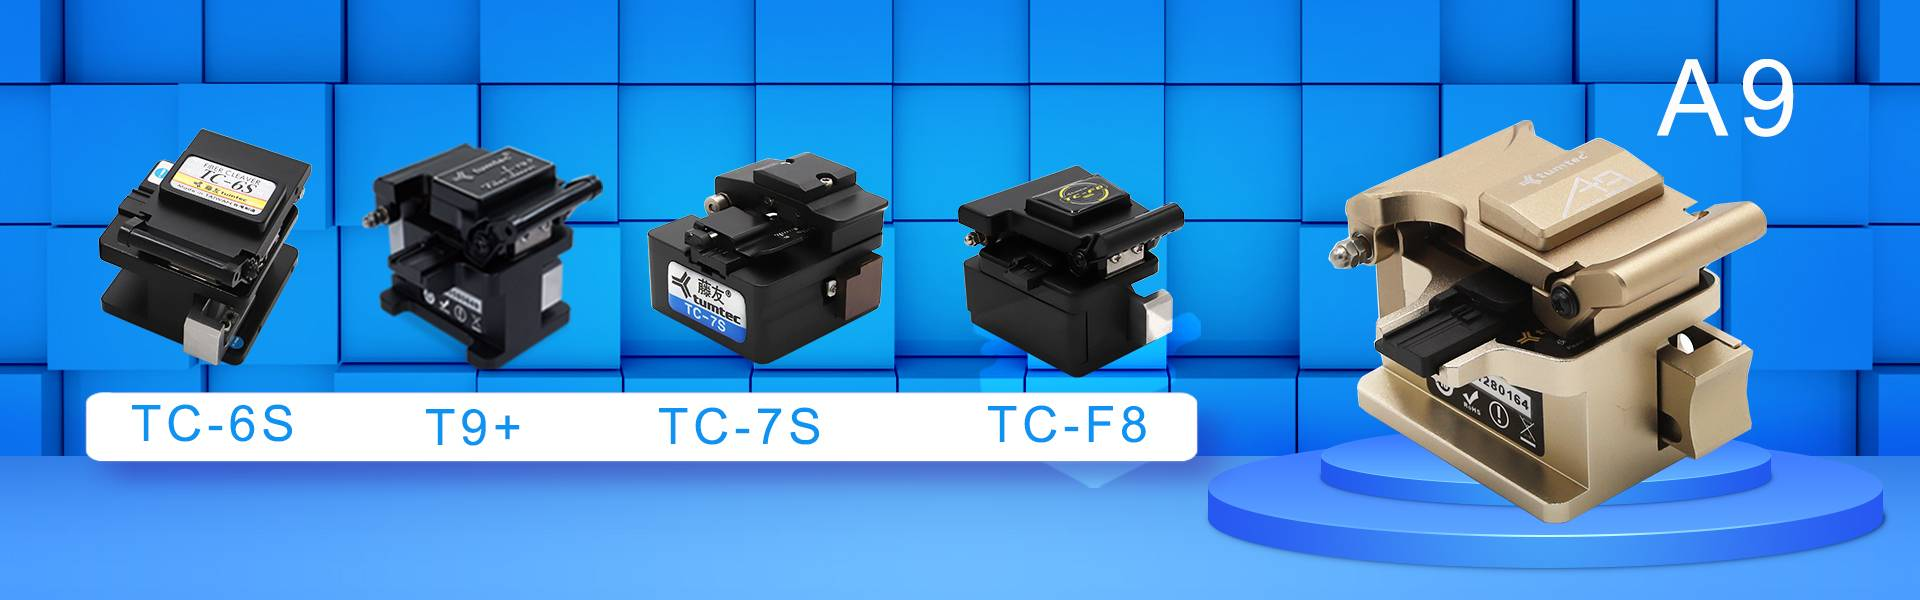 Tumtec optical fiber cleaver